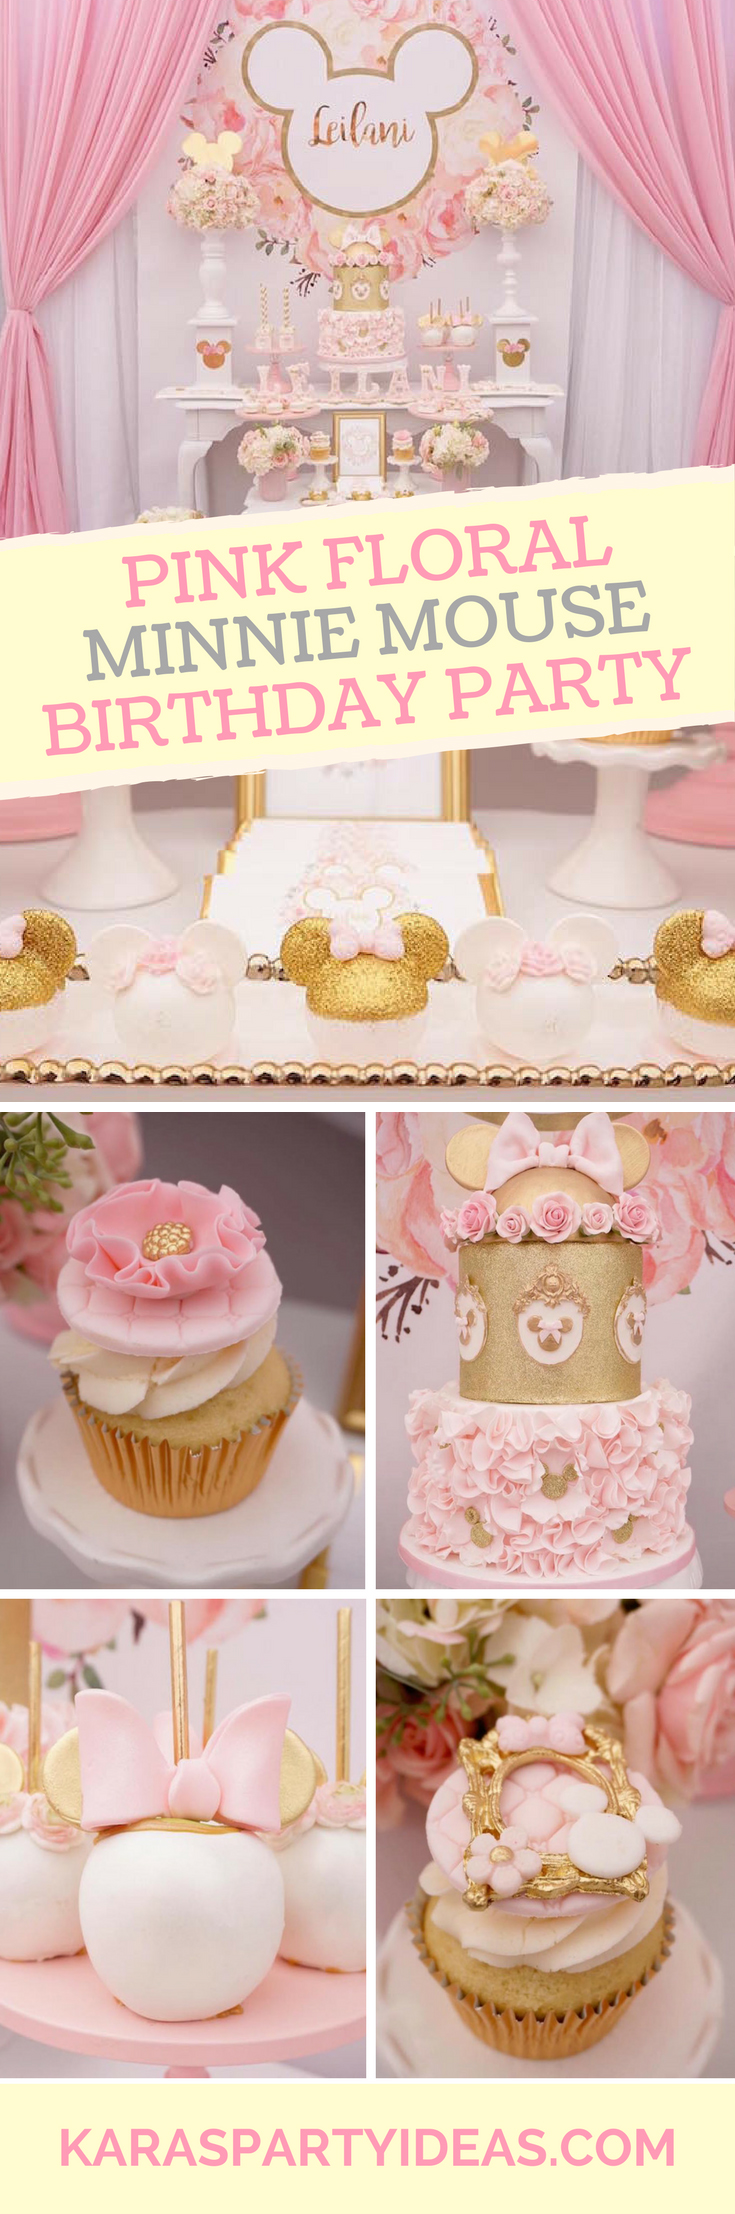 Pink Floral Minnie Mouse Birthday Party via Kara's Party Ideas - KarasPartyIdeas.com